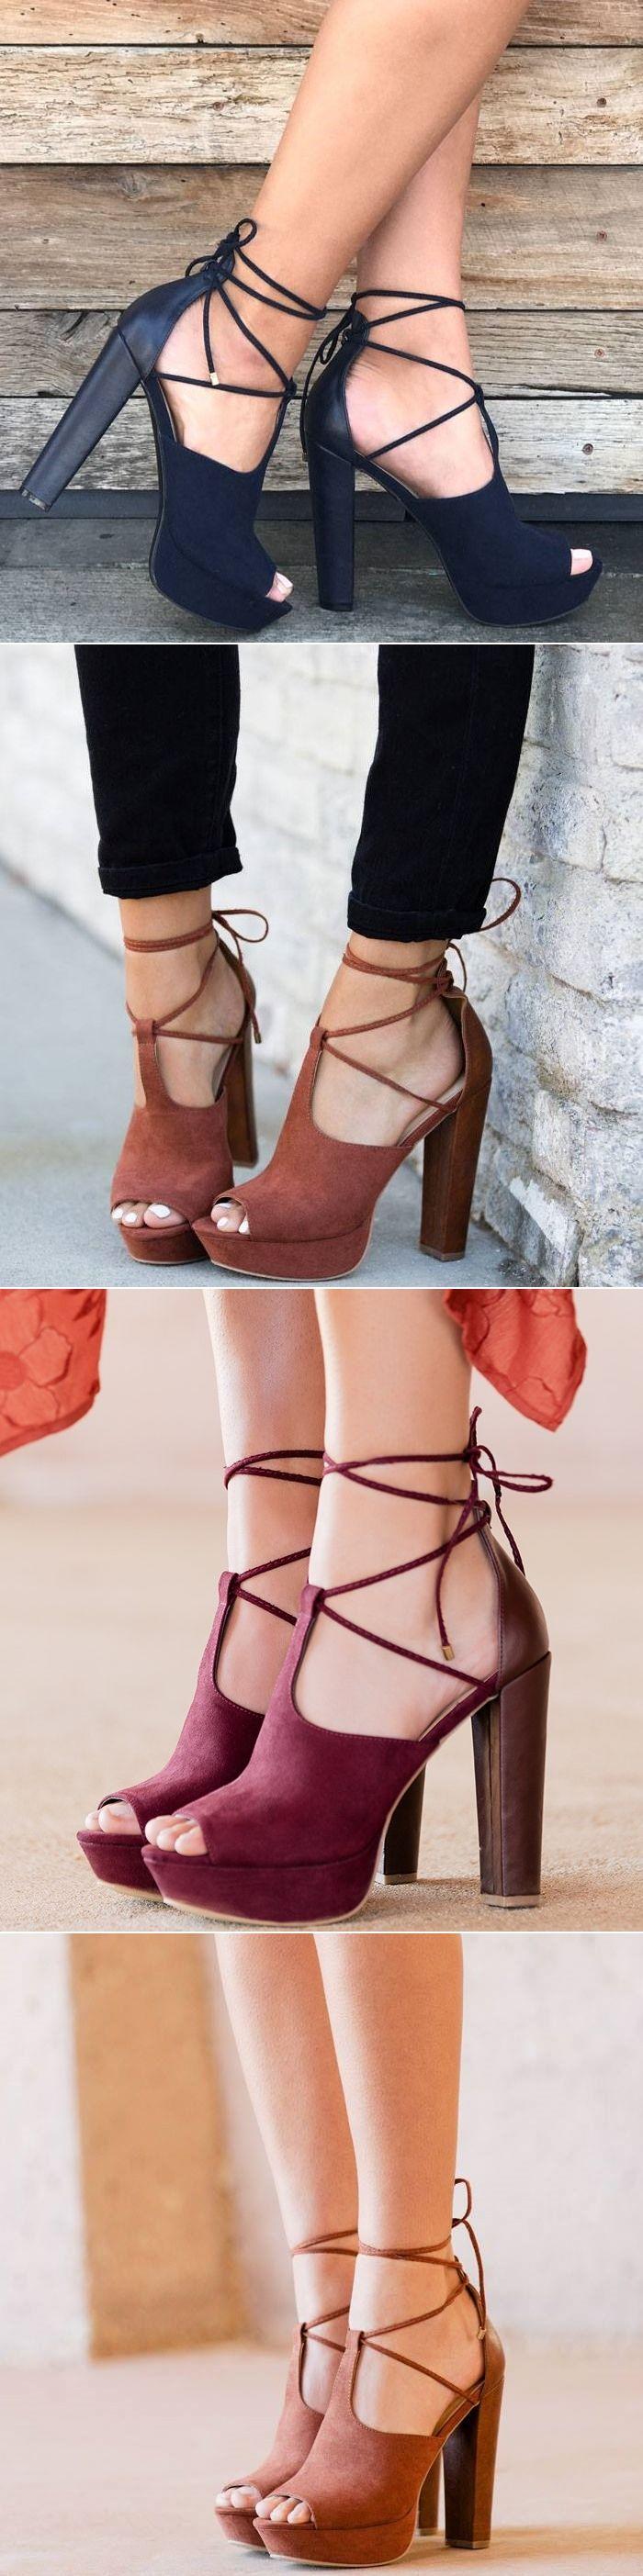 'Marlena' Lace-Up Chunky Heels